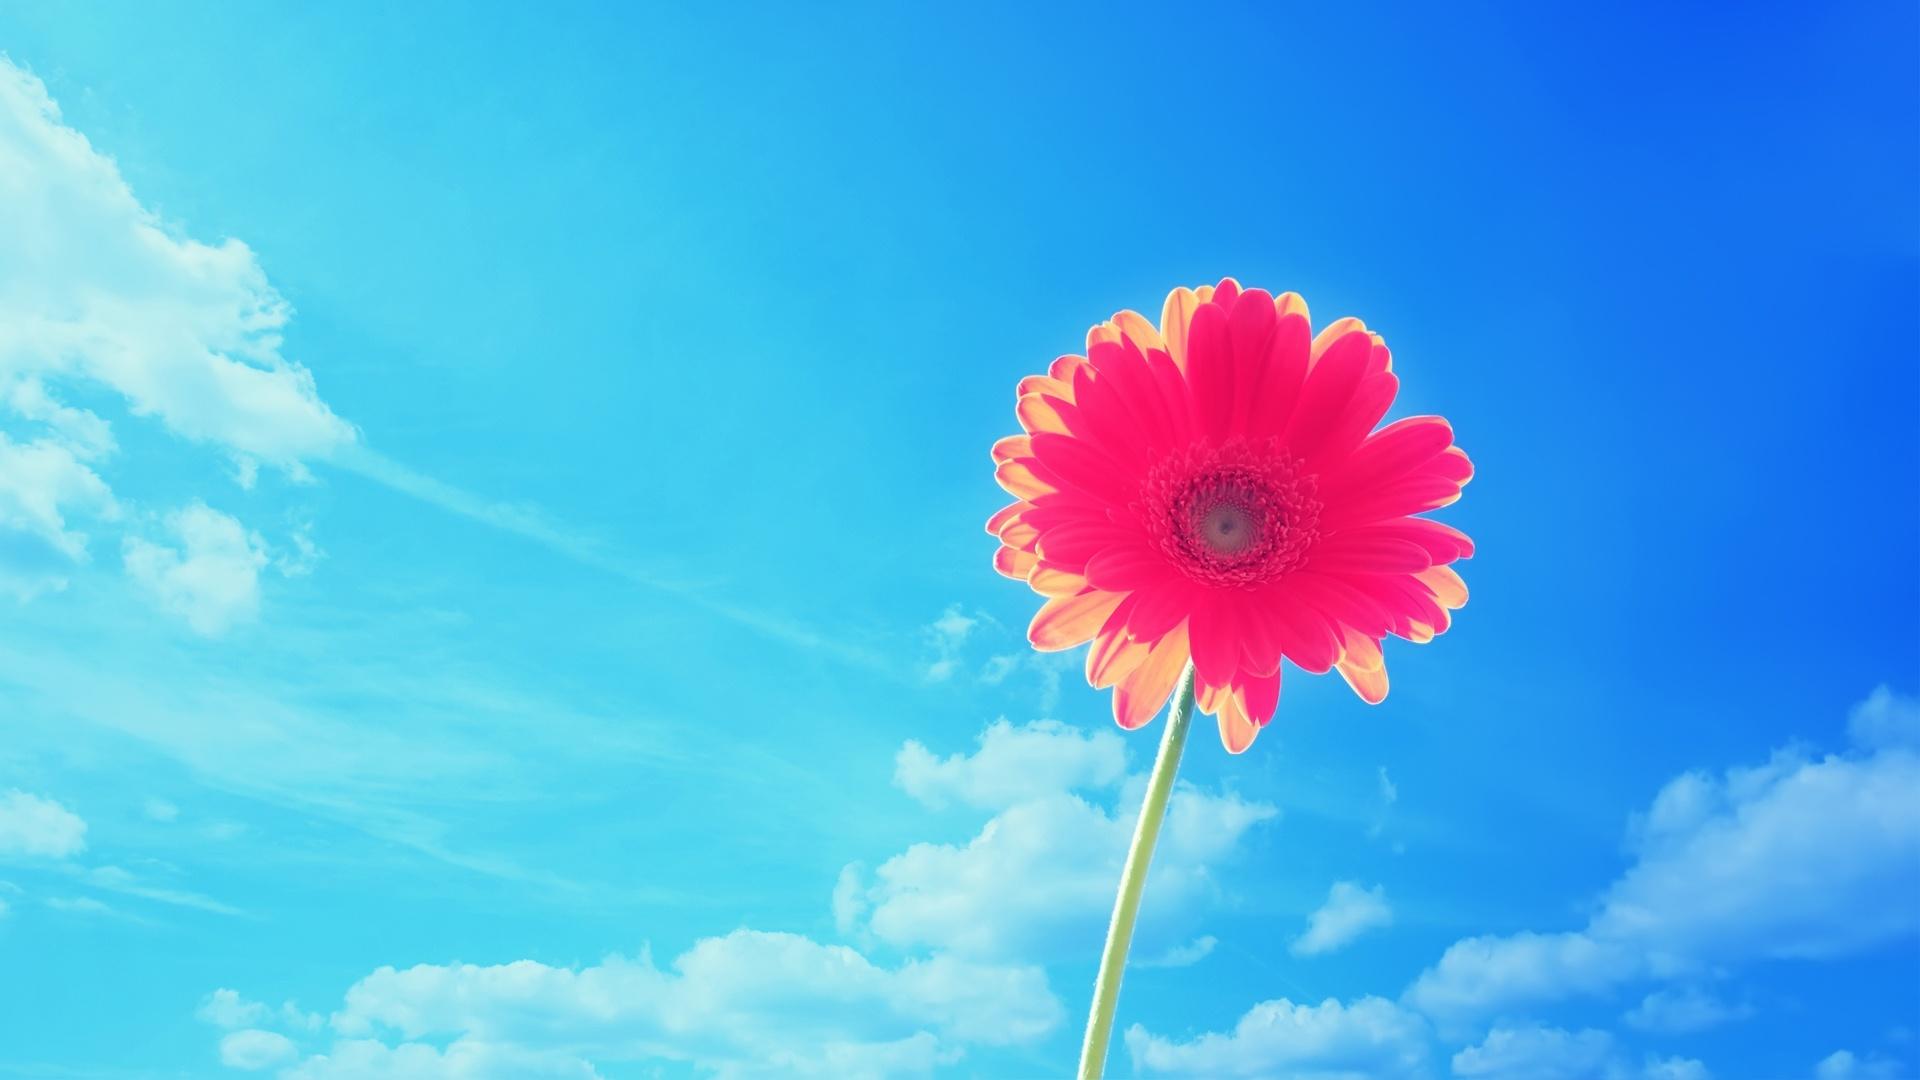 Pink Gerbera Flower Wallpapers HD 1080p HD Wallpapers 1920x1080